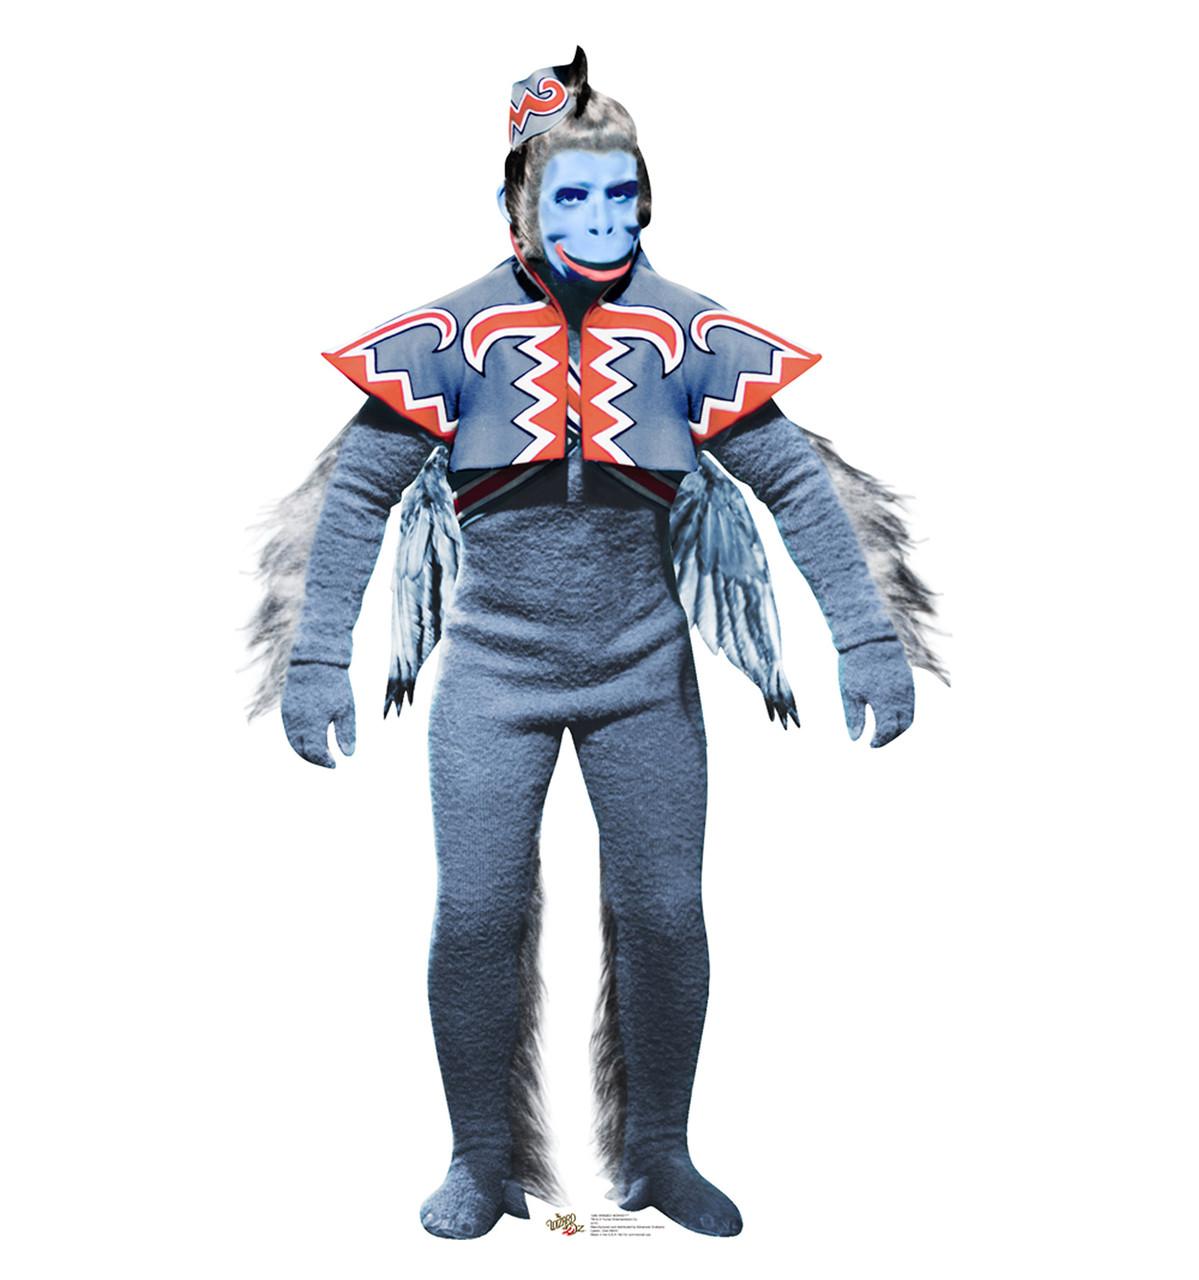 Winged Monkey - Cardboard Cutout